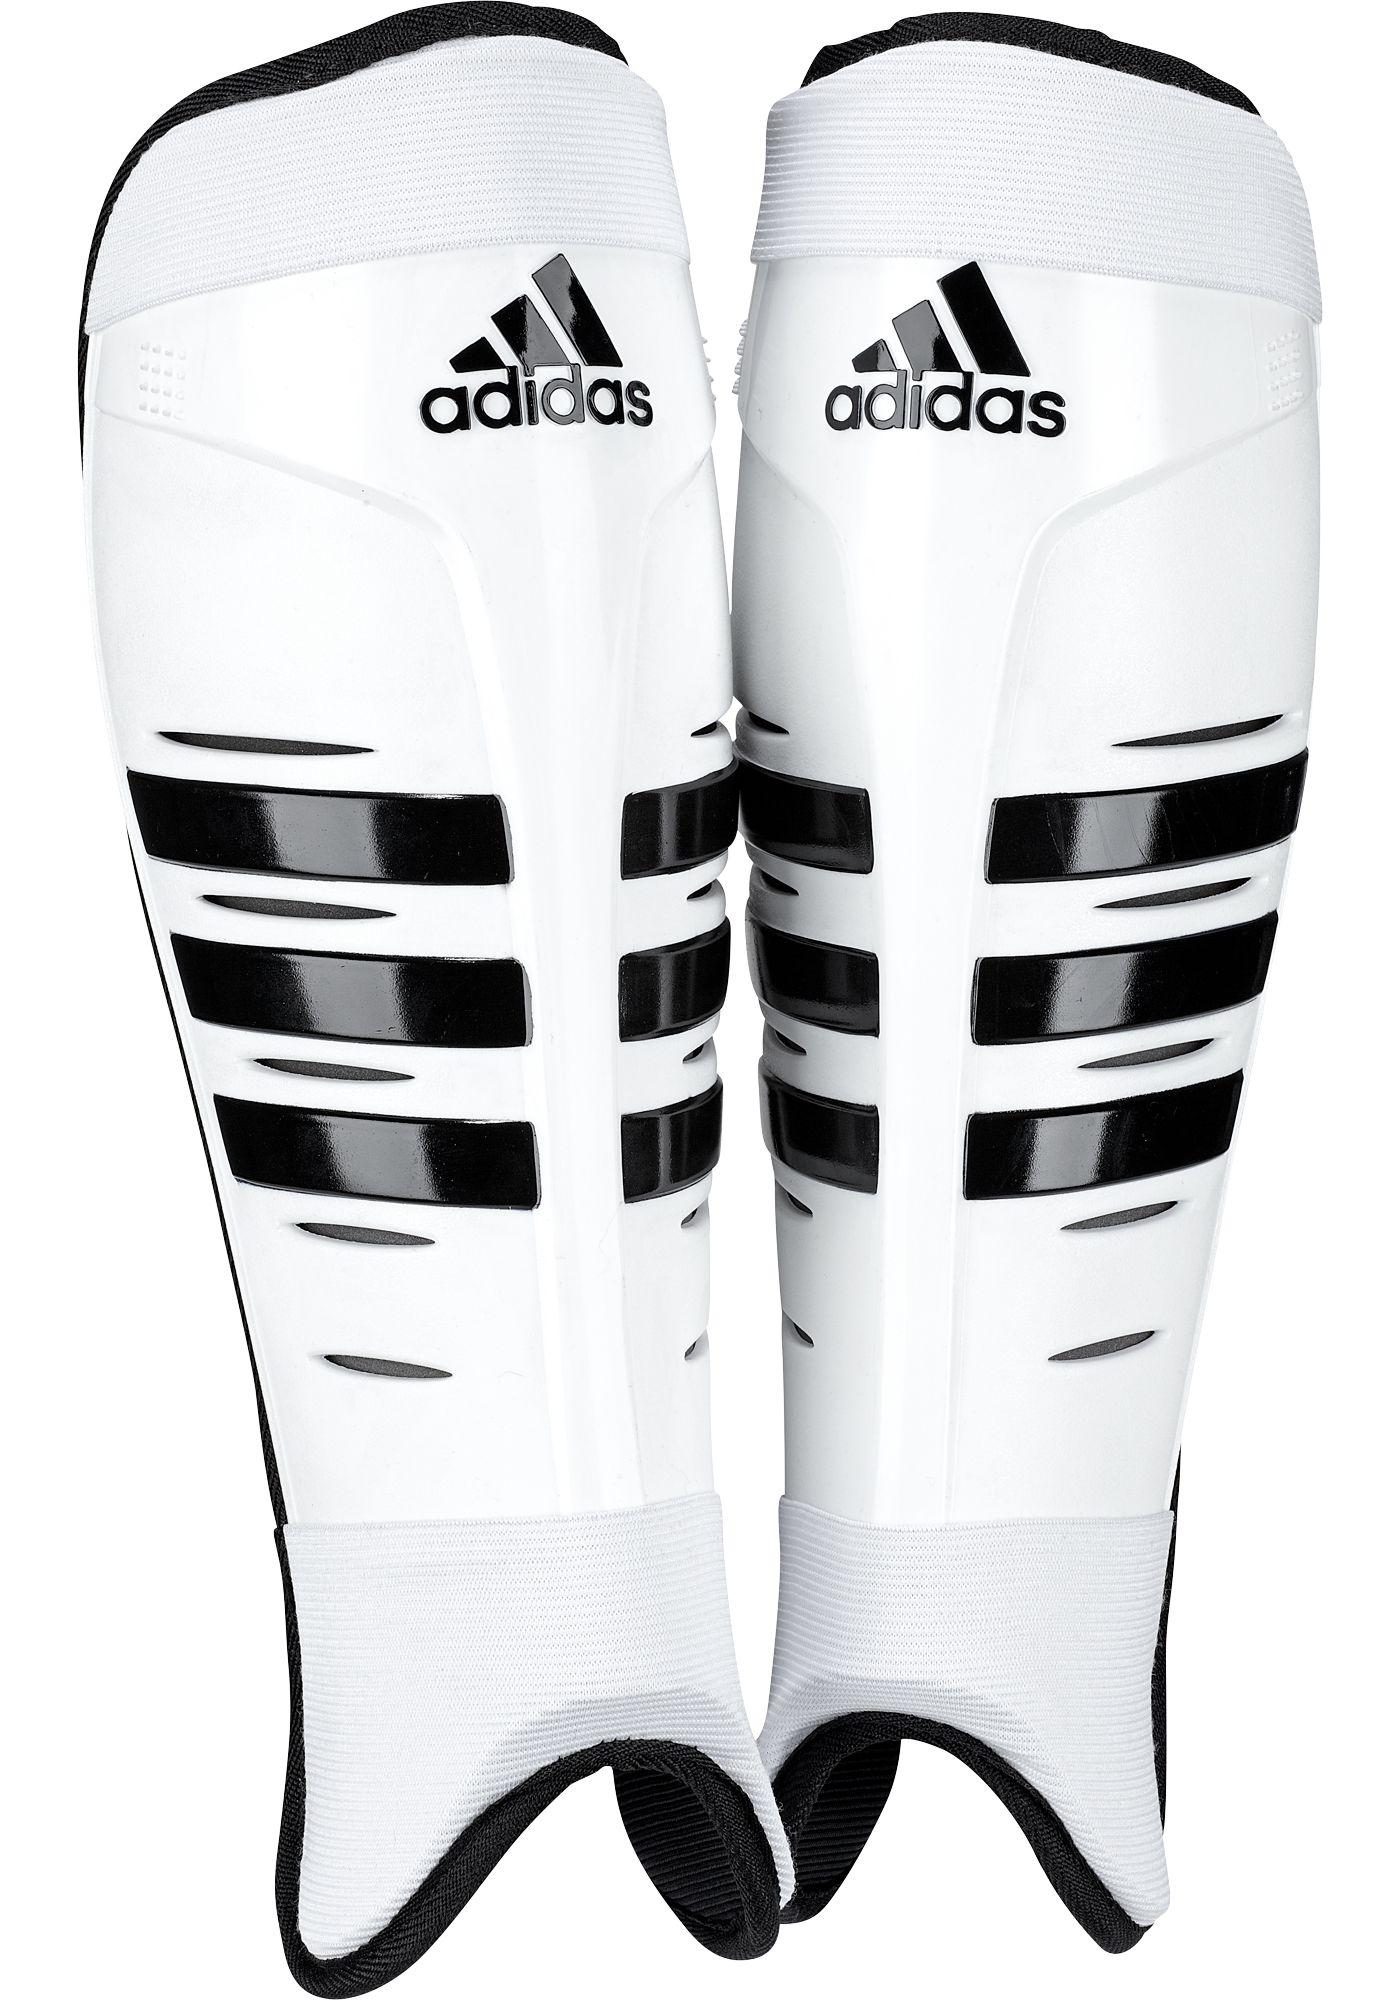 adidas Adult Field Hockey Shin Guards